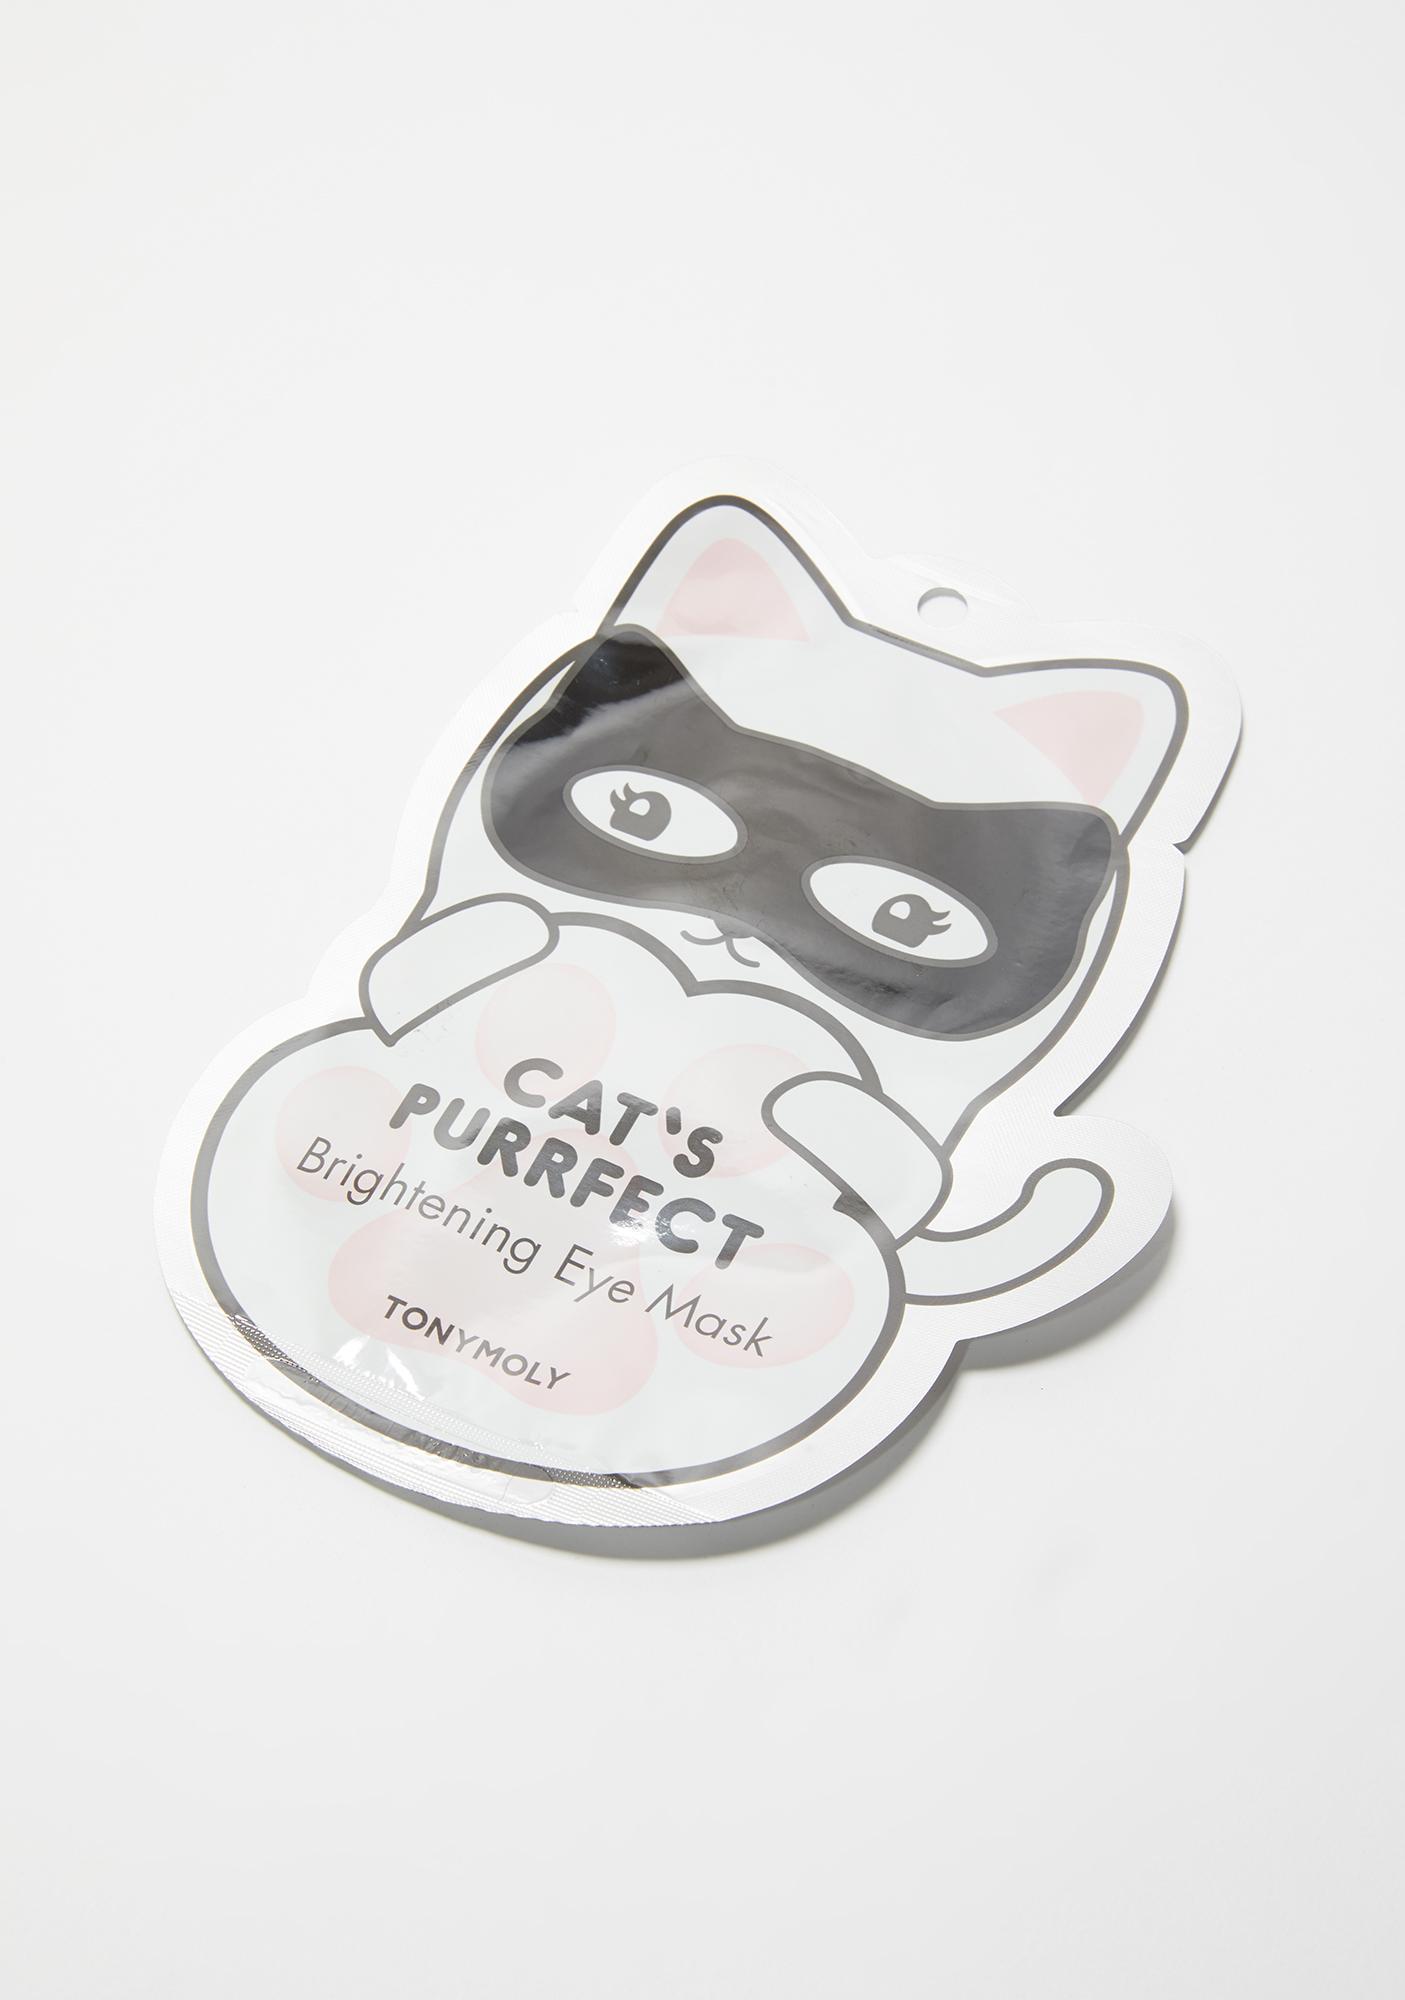 TONYMOLY Cat's Purrfect Brightening Eye Mask